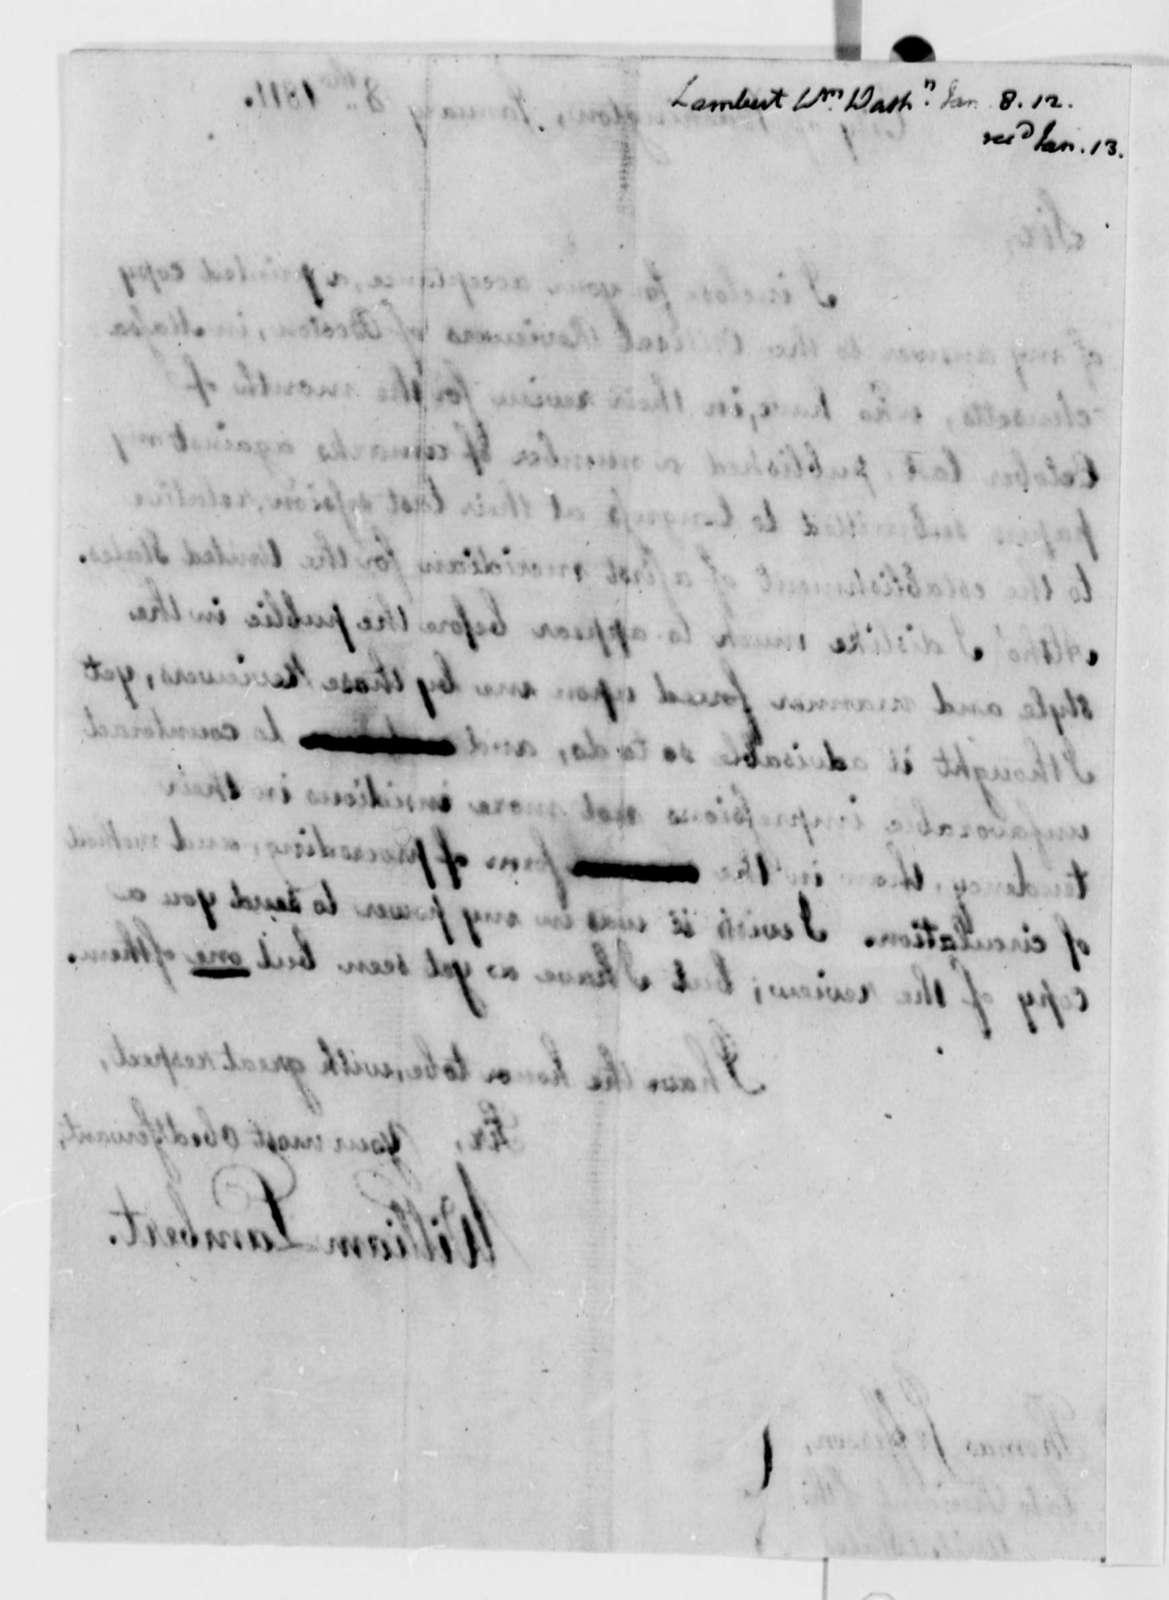 William Lambert to Thomas Jefferson, January 8, 1811